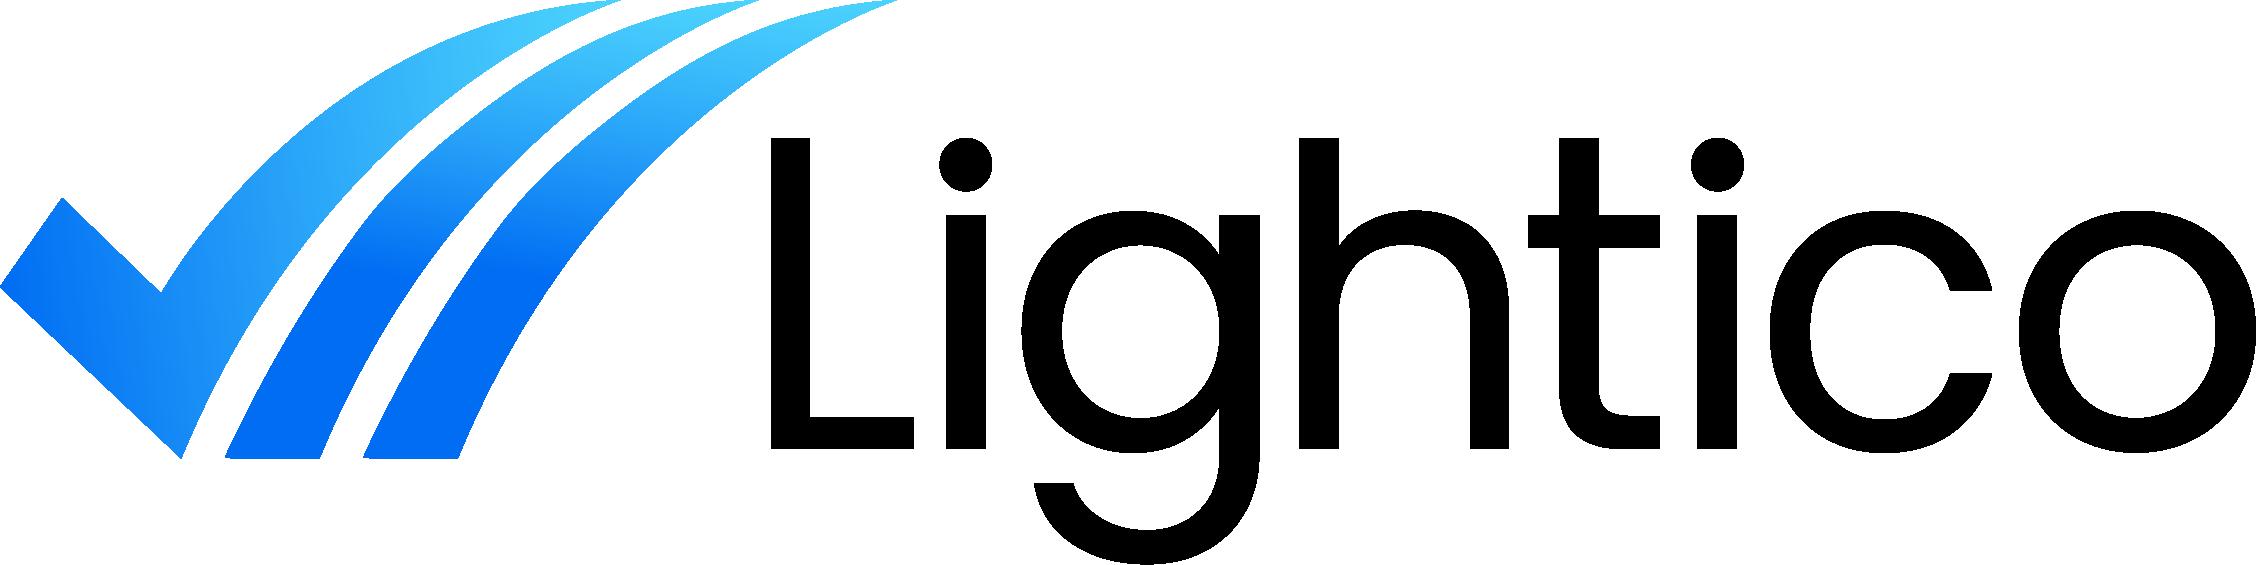 Lightico-Logo-1